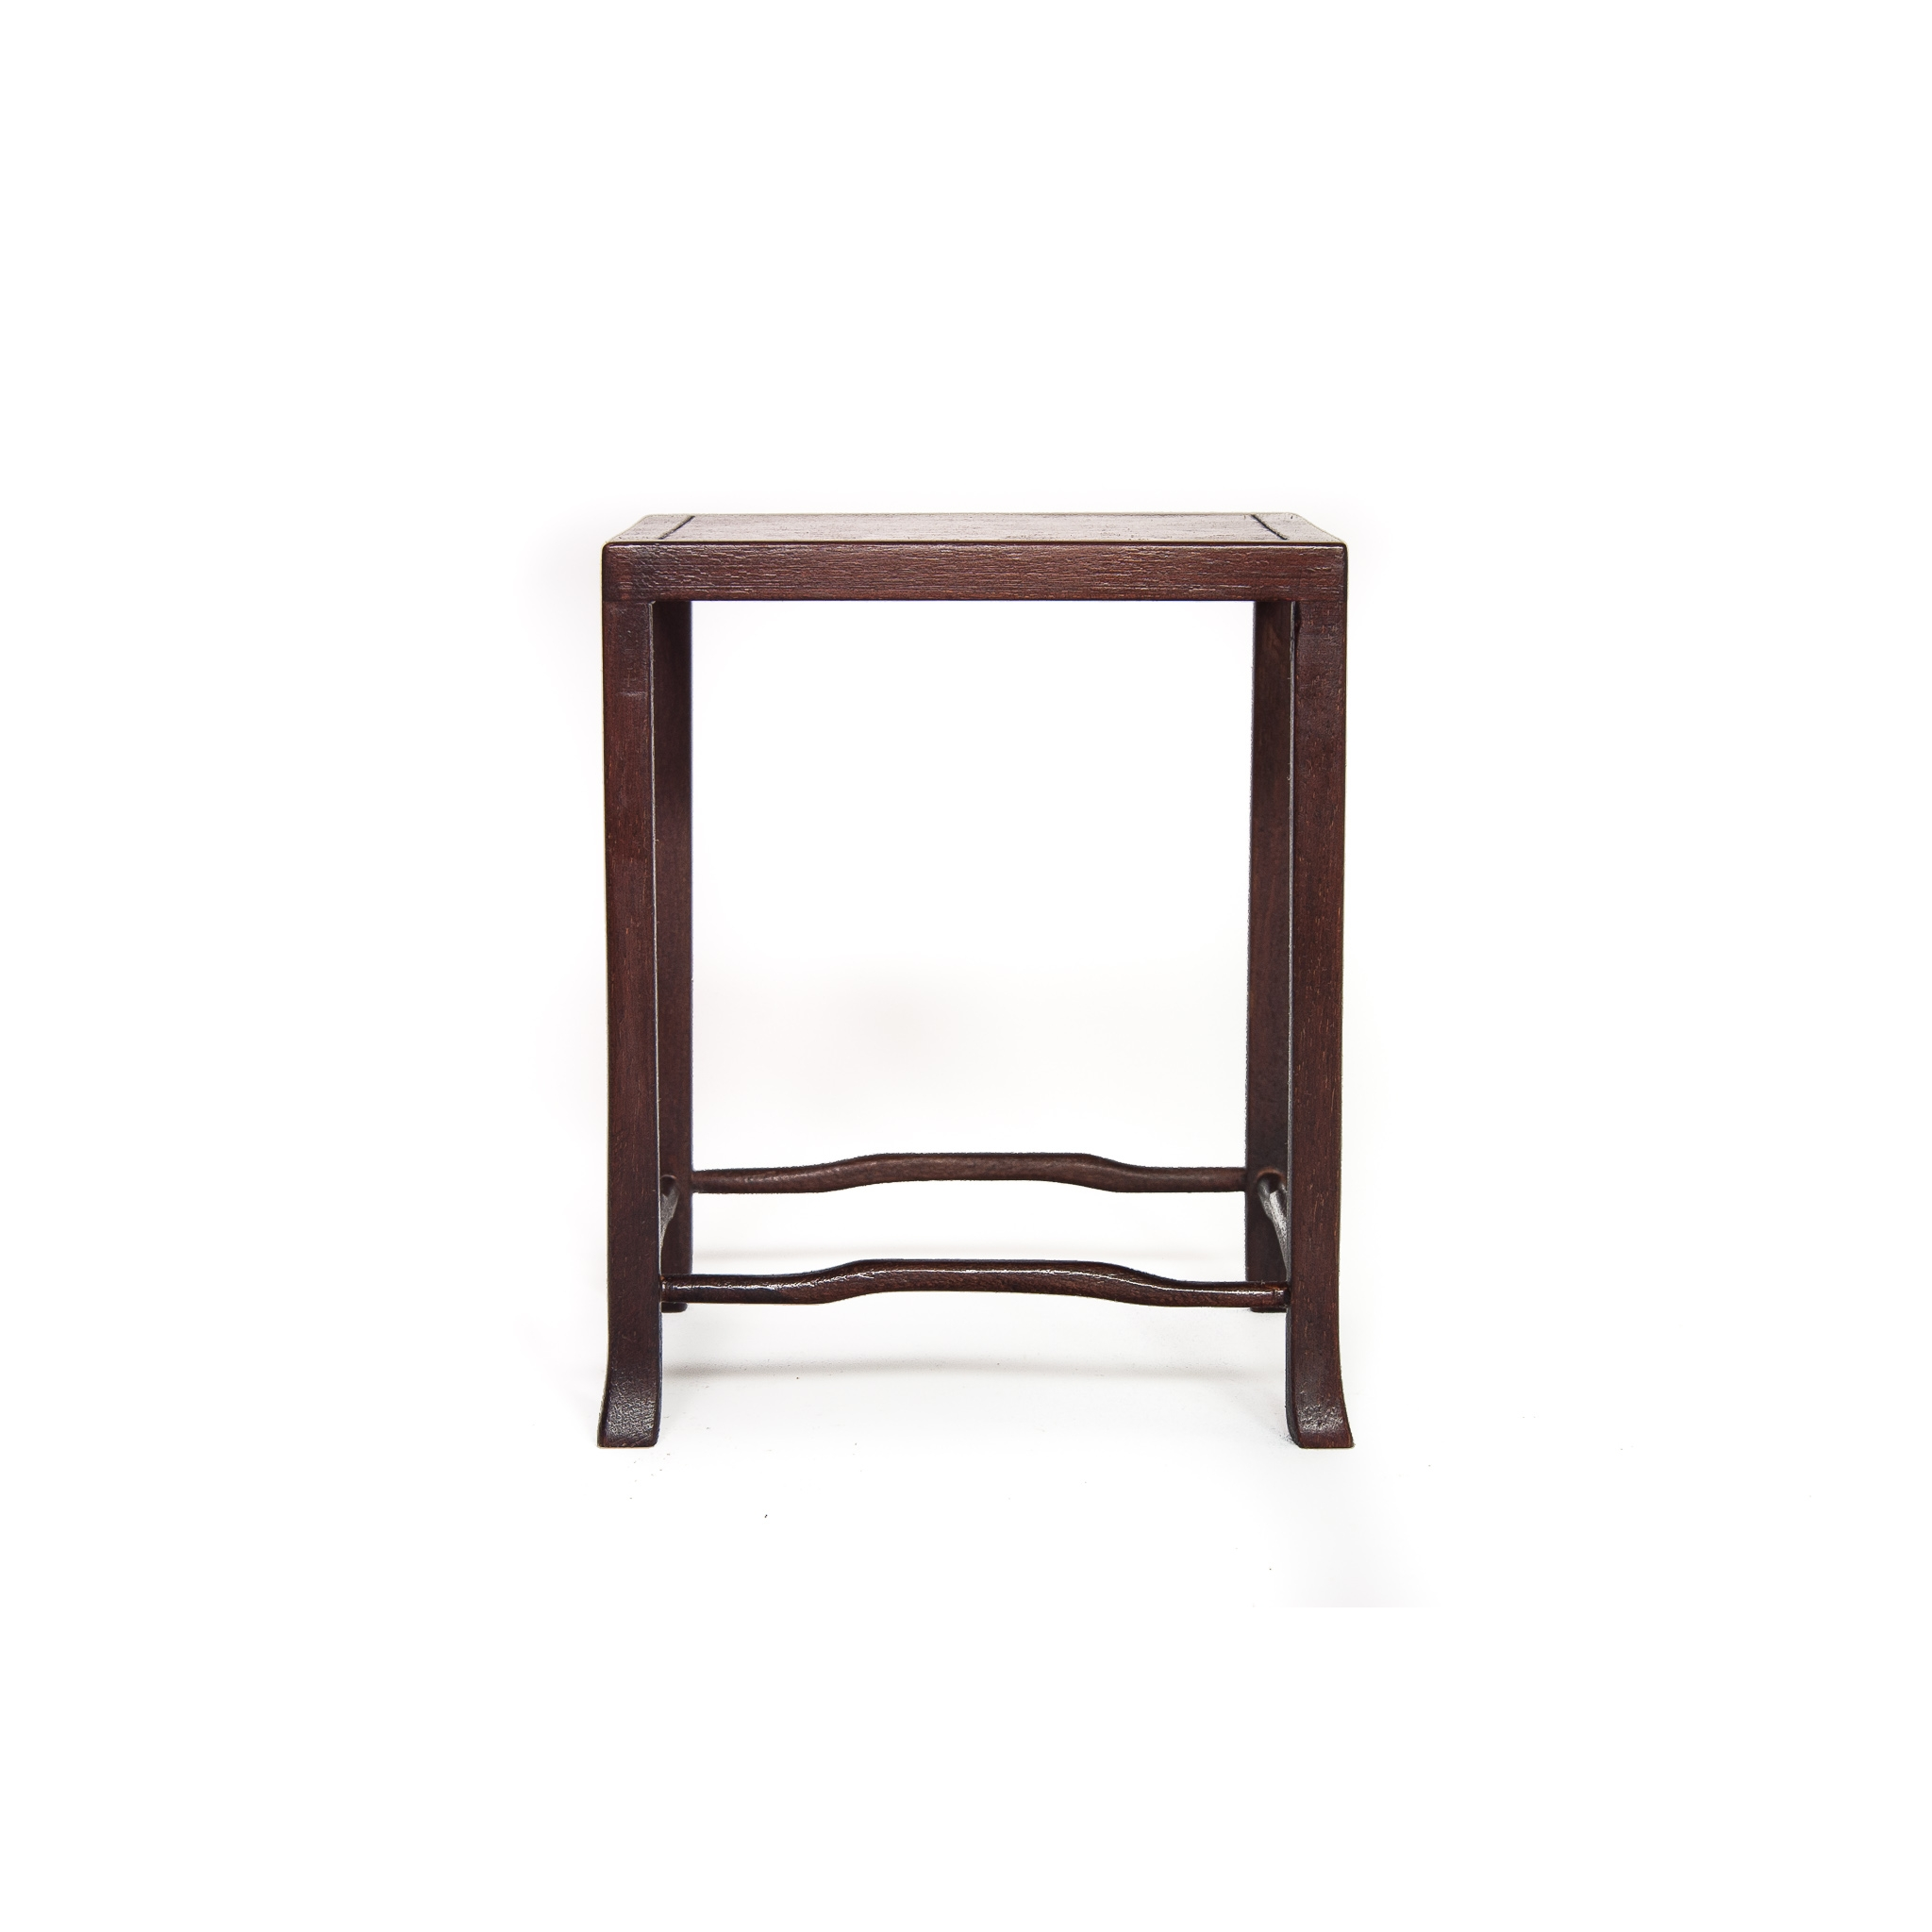 Exhibition Table Bonsai